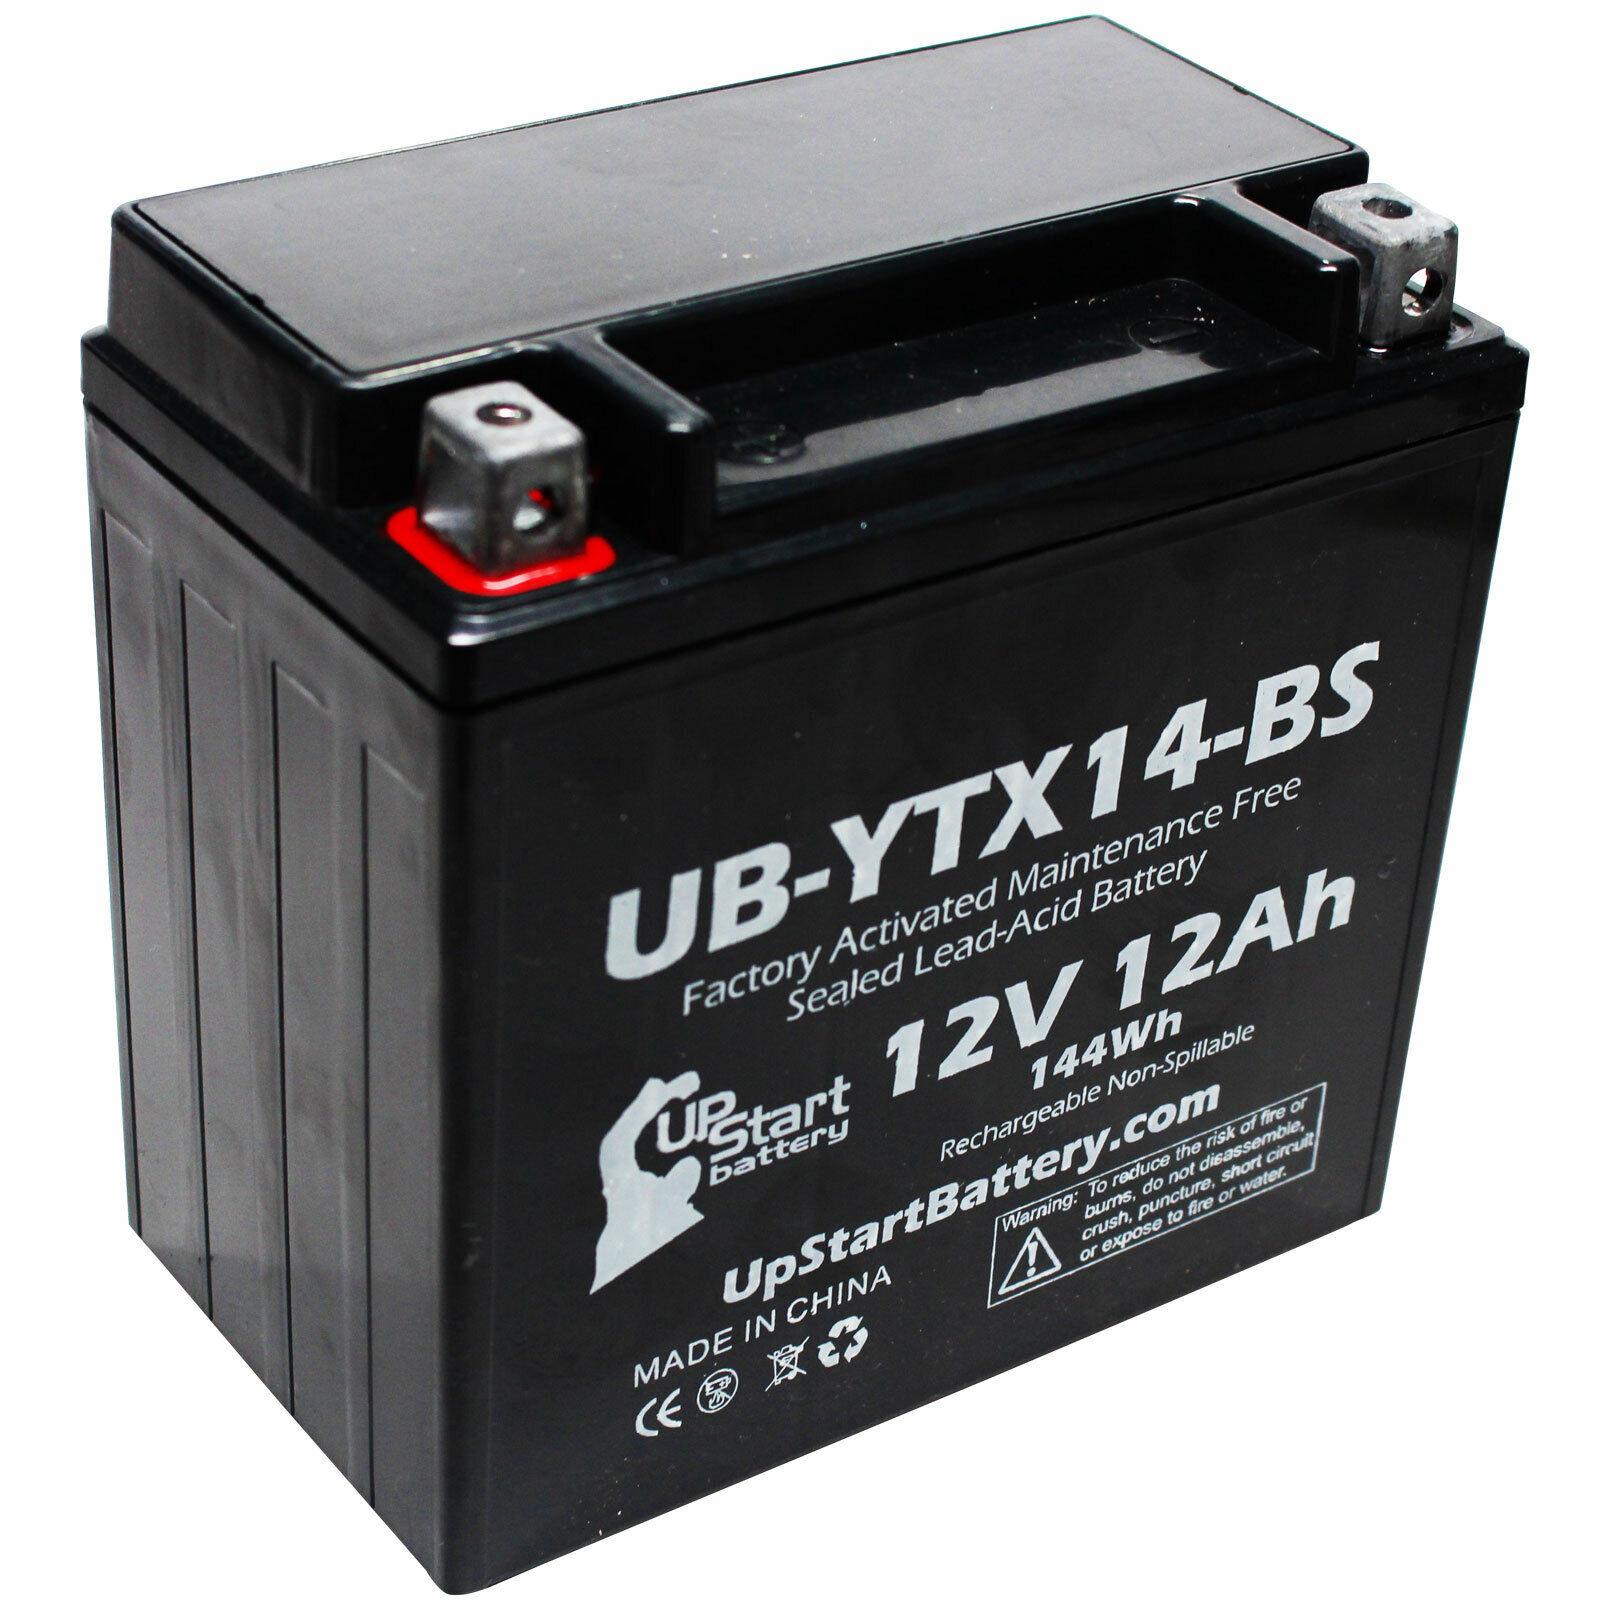 12V 12AH Battery for 1989 Honda TRX300 Fourtrax 300 CC